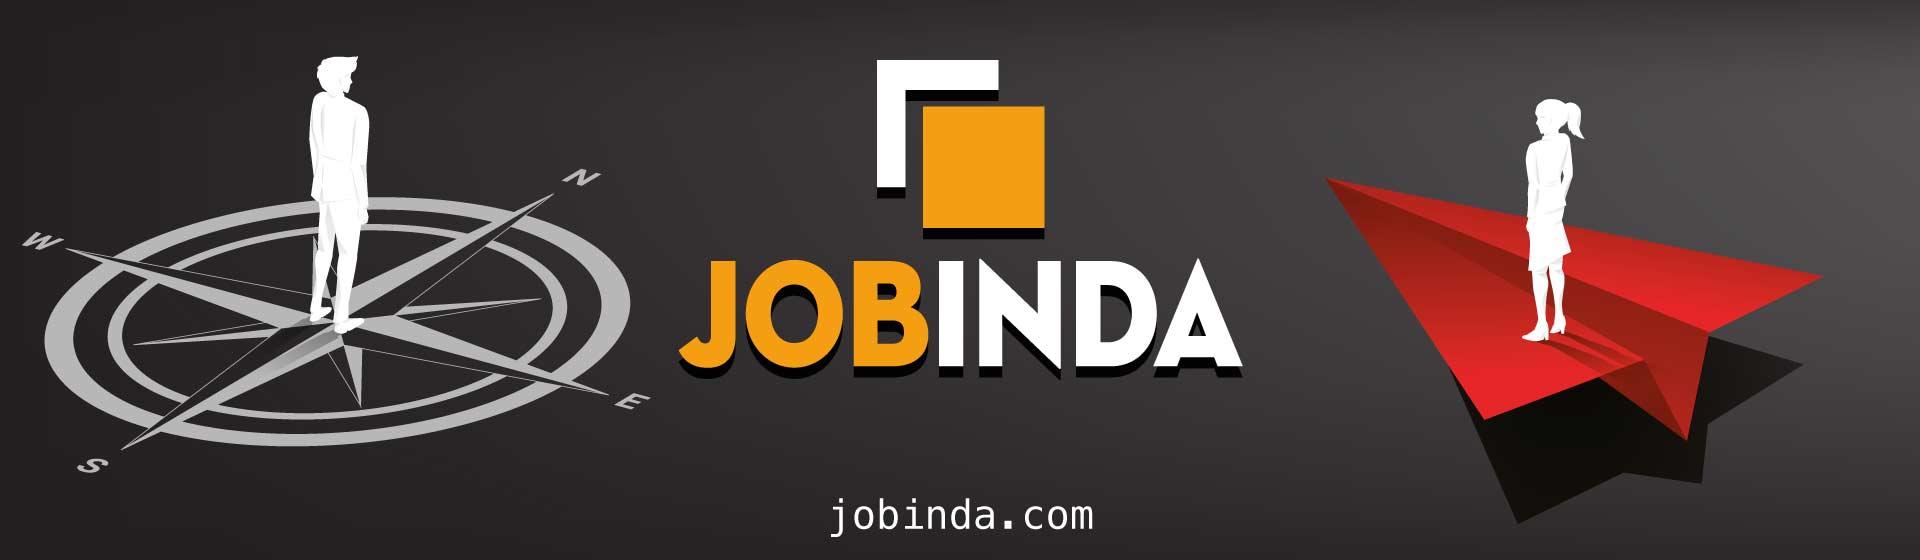 Jobinda - Branding Design by Brandizle